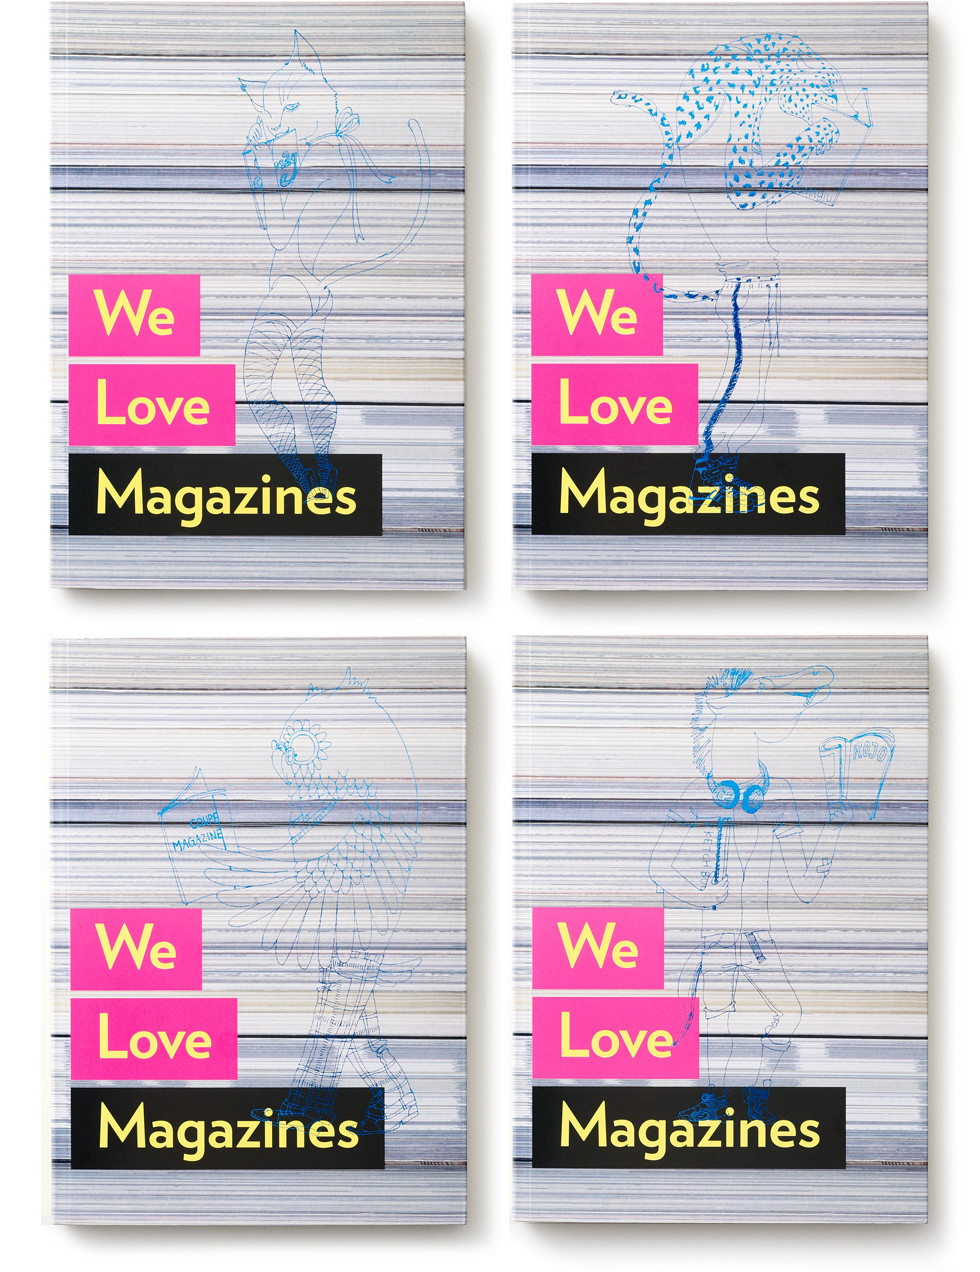 We Love Magazines Colophon Main Visual |  mio.matsumoto